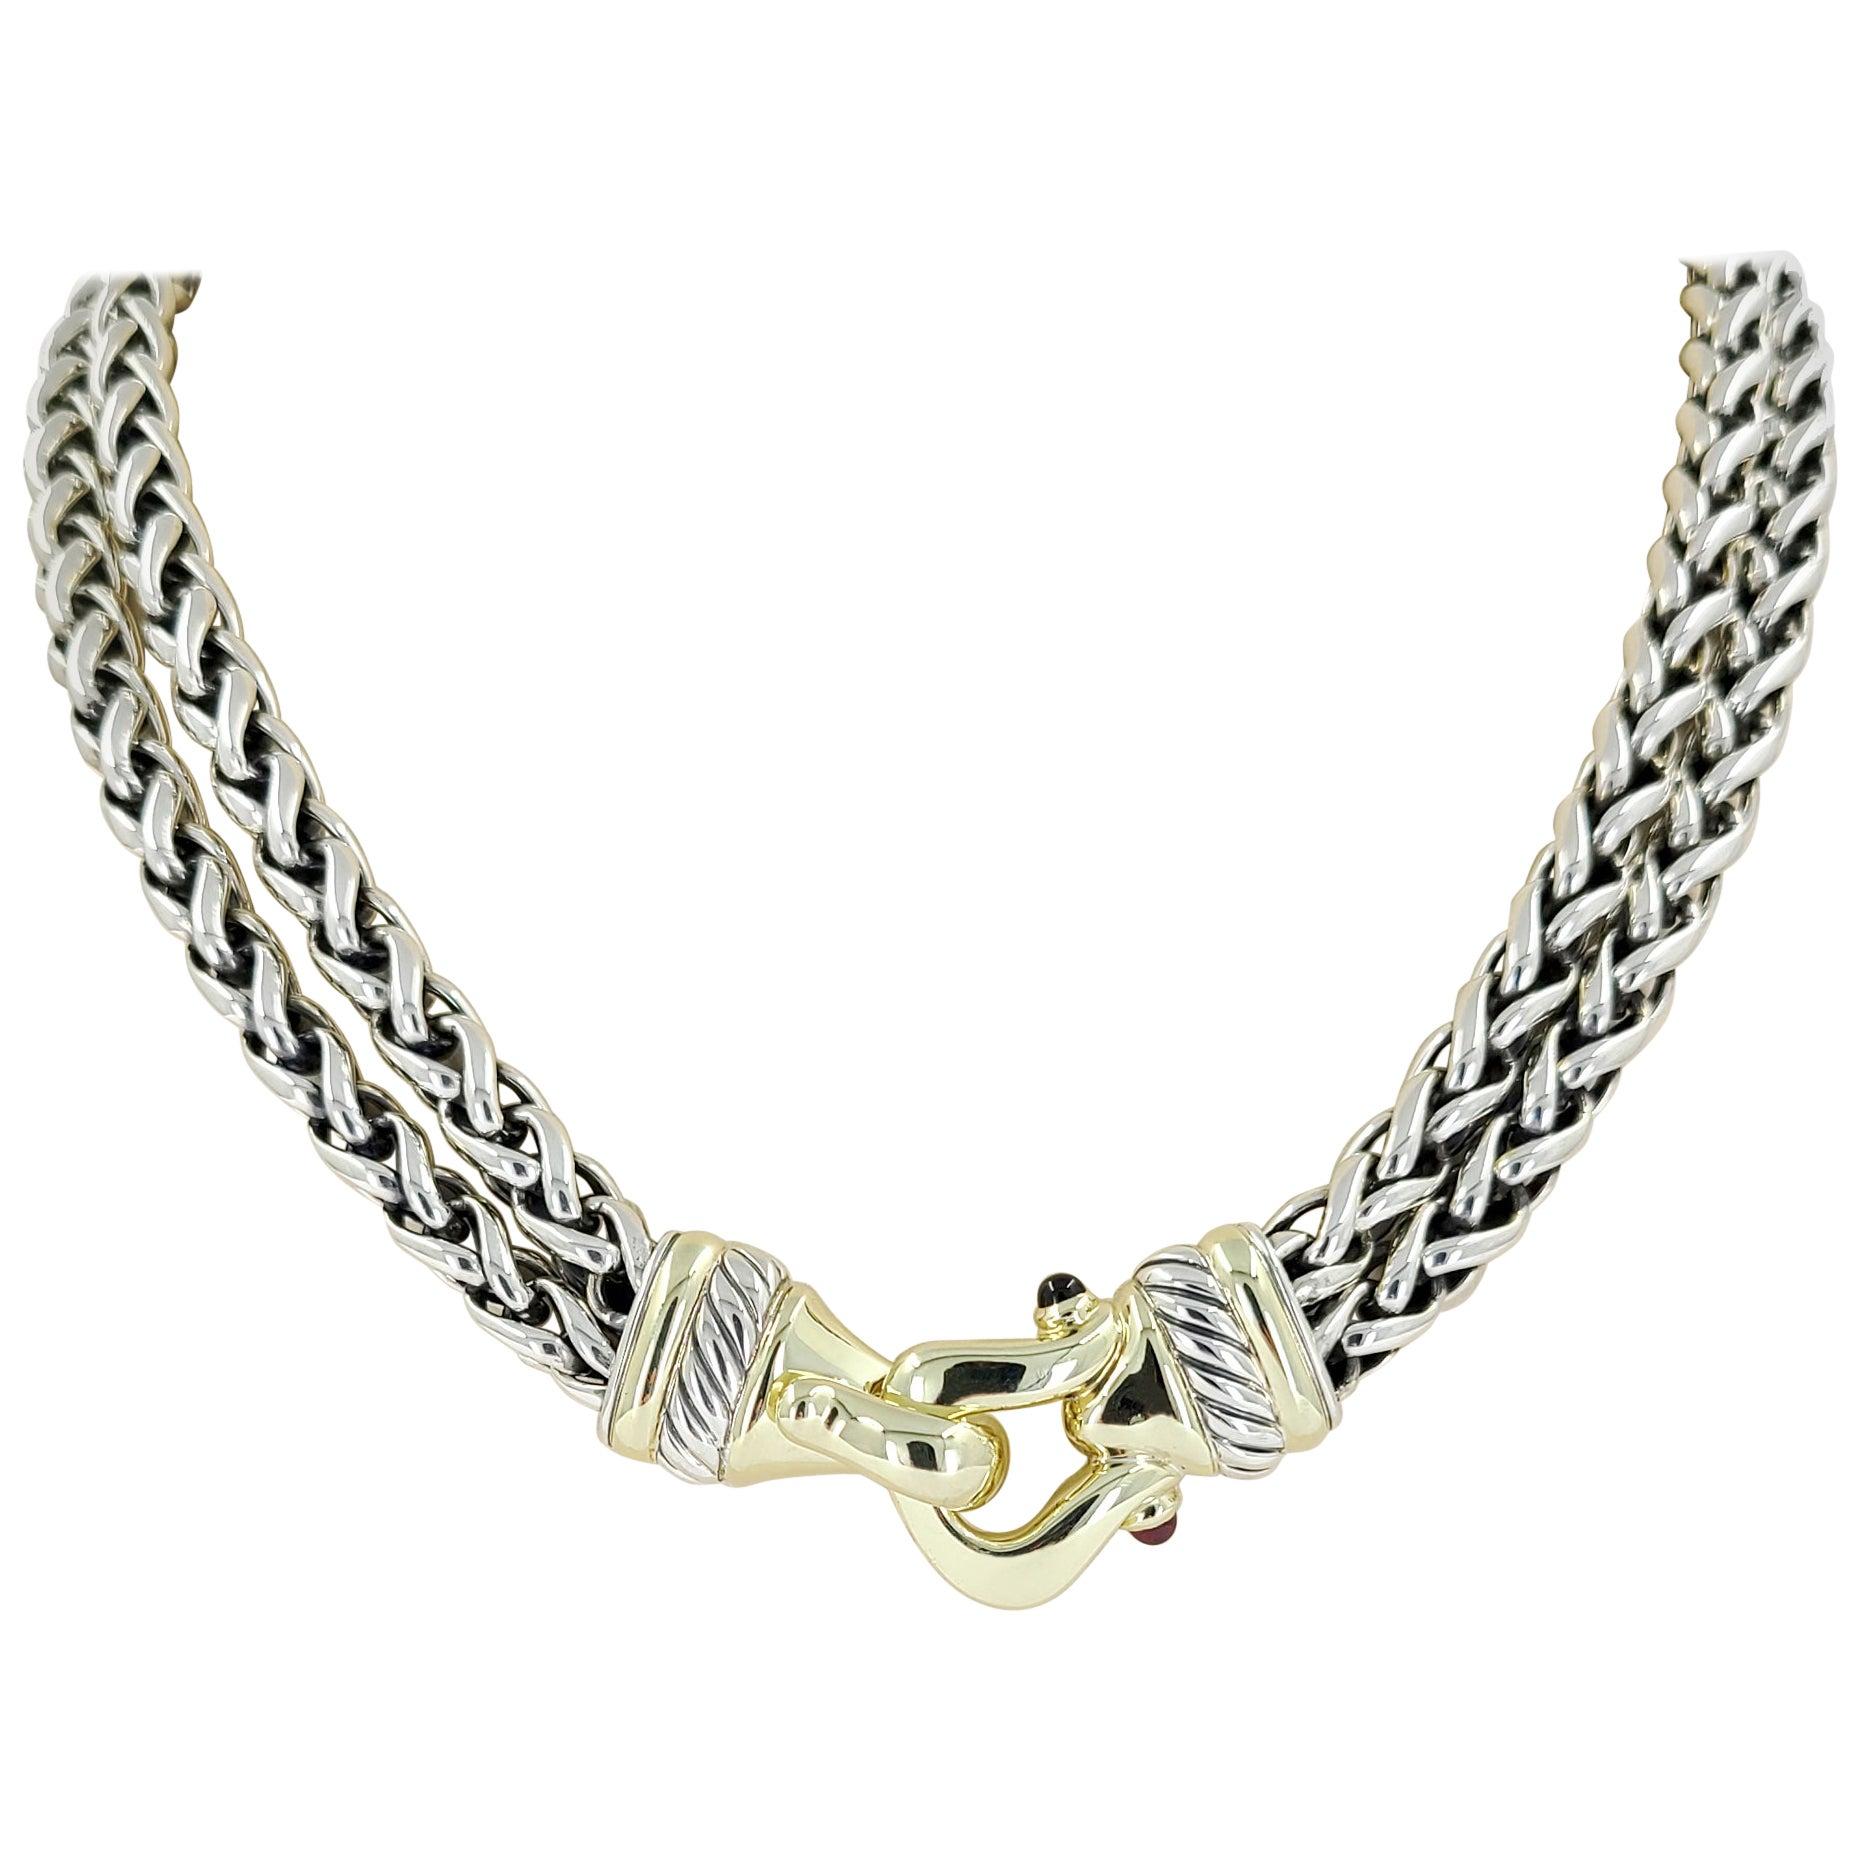 David Yurman 14 Karat Yellow Gold & Sterling Silver Buckle Necklace